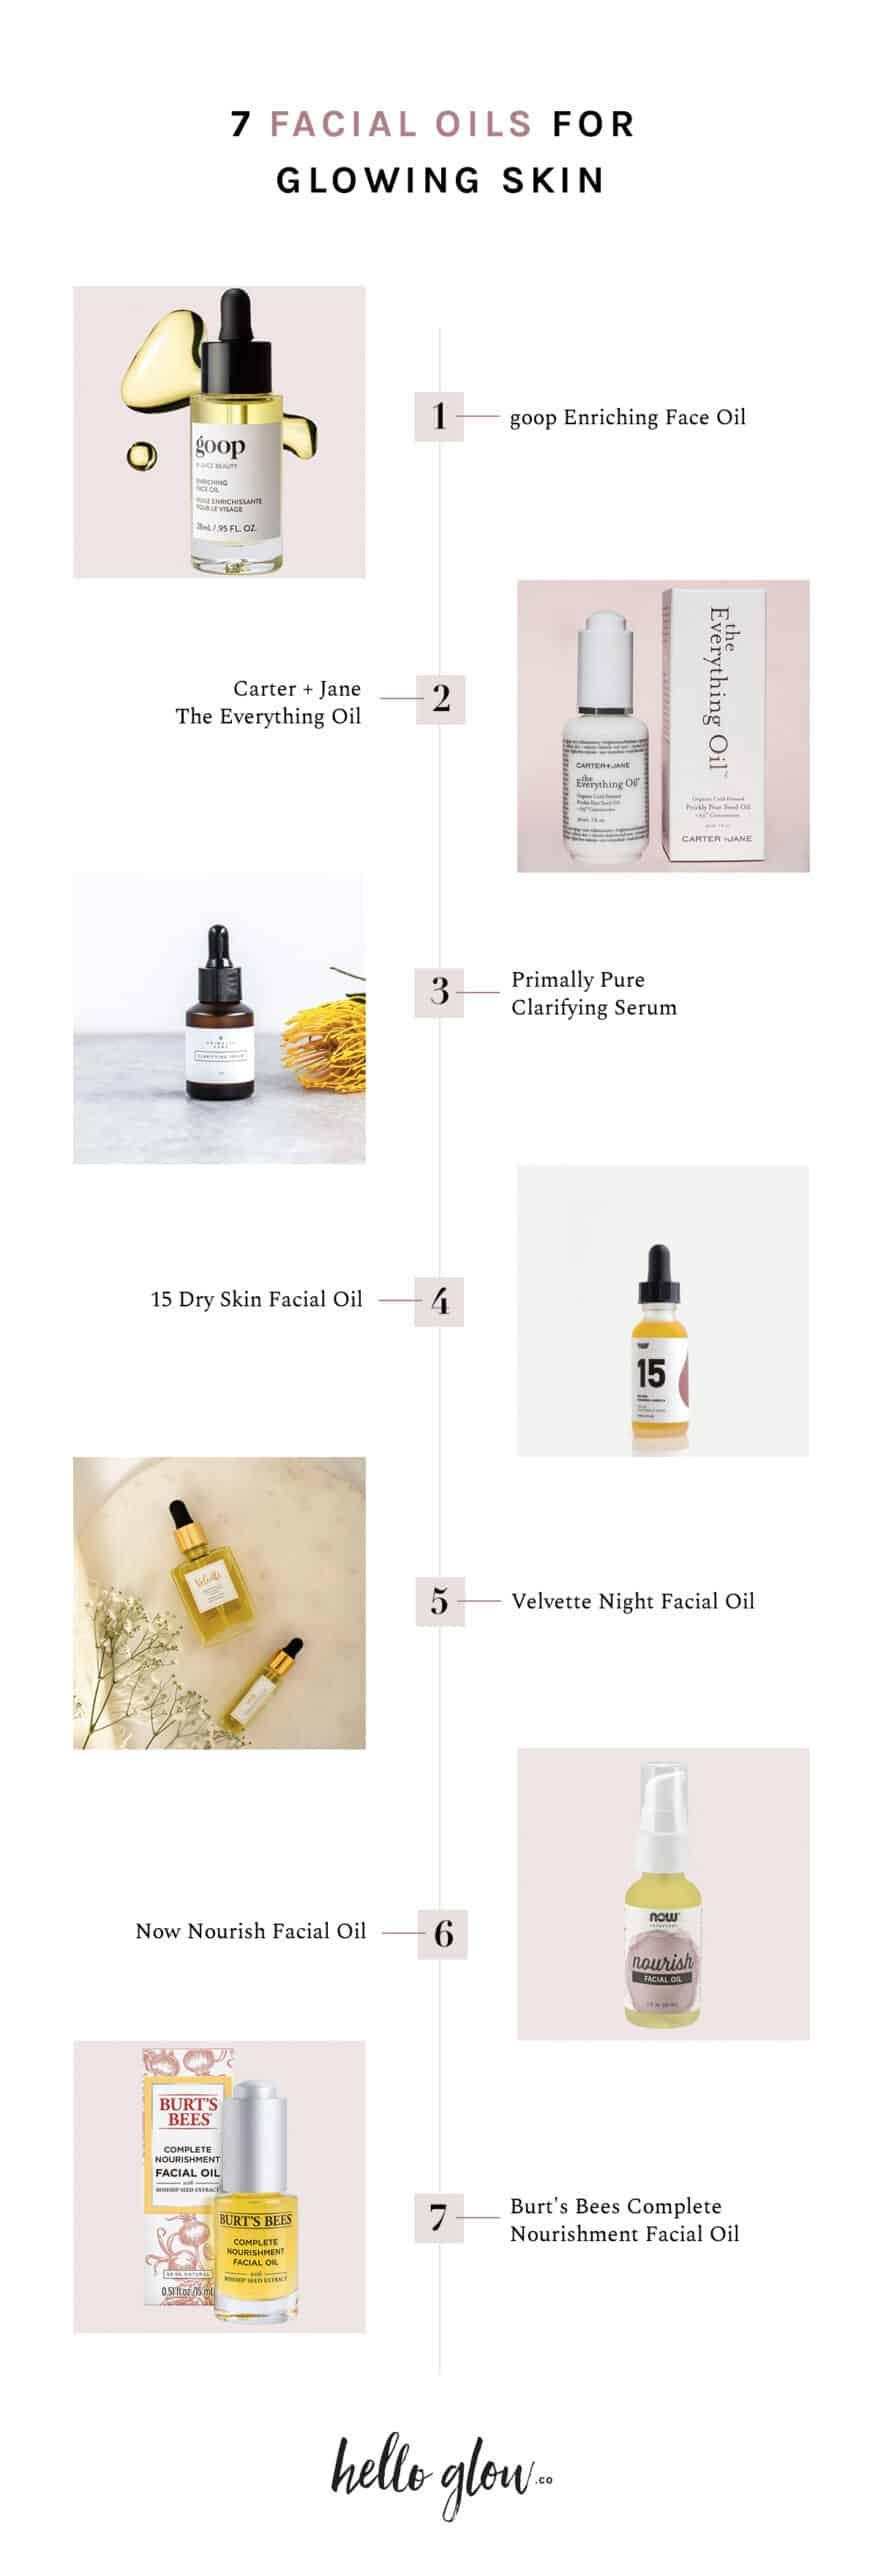 7 Favorite Facial Oils for Glowing Skin - Hello Glow